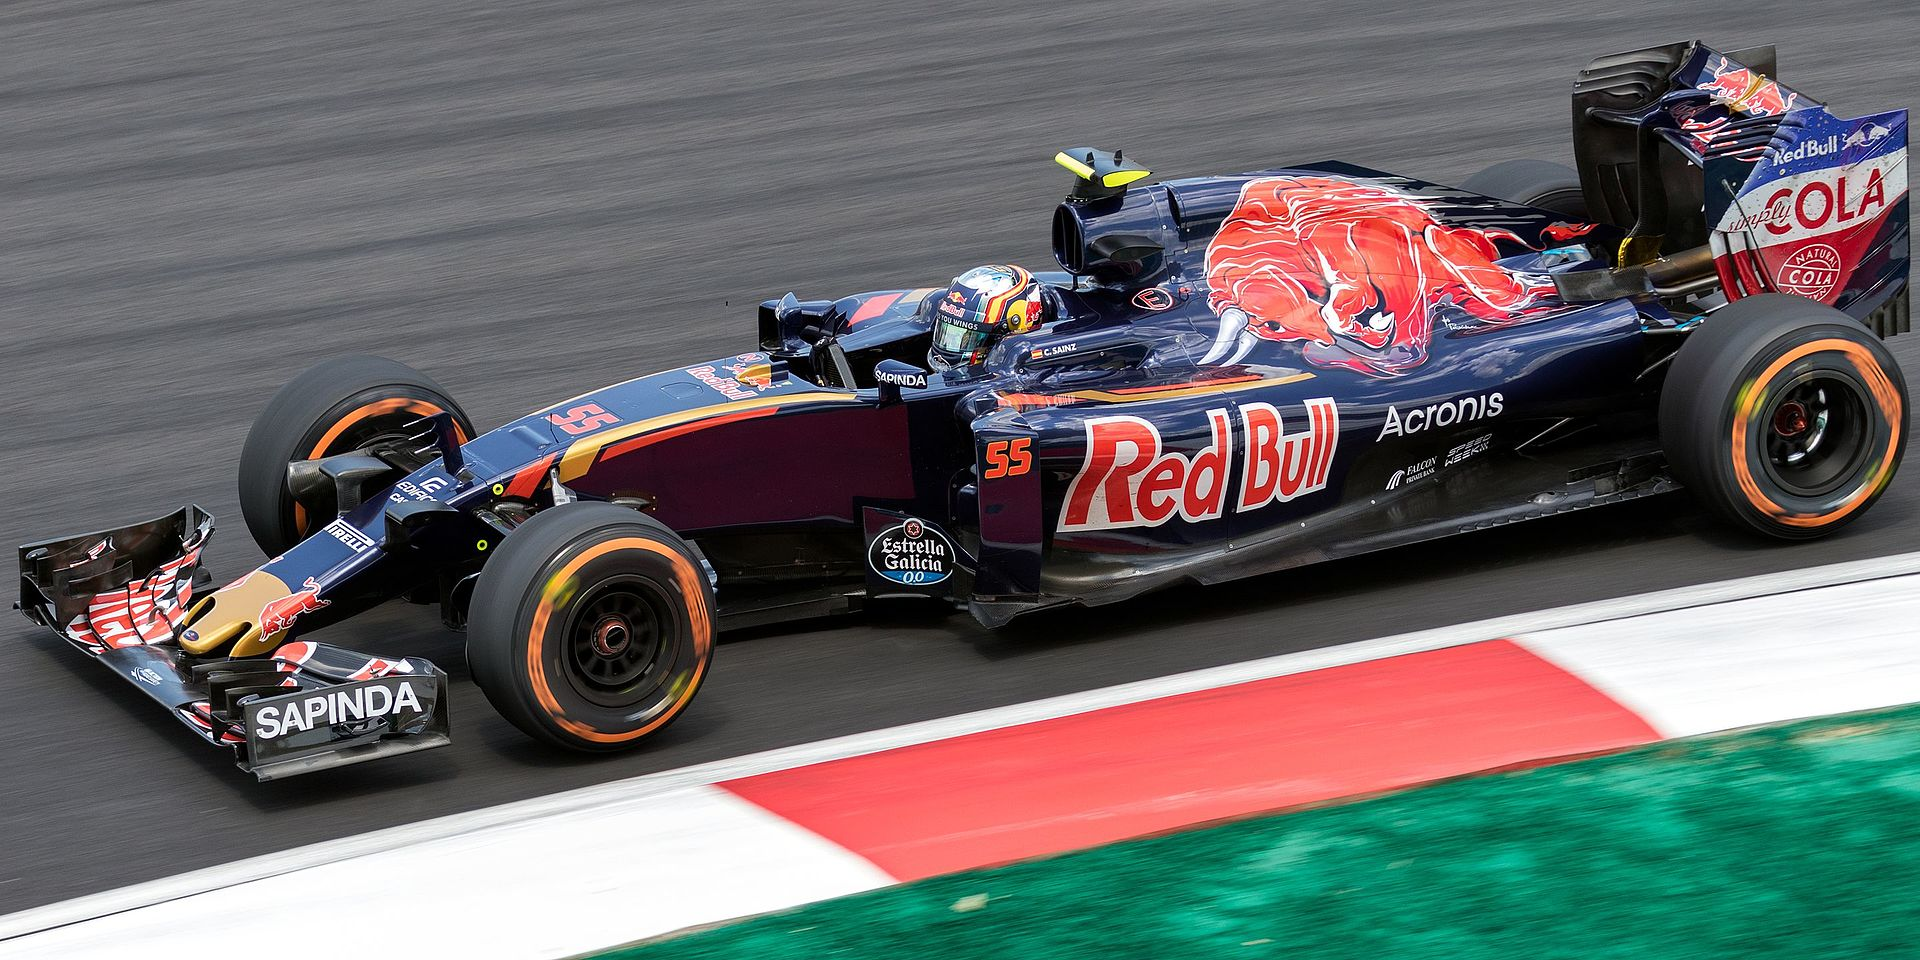 Scuderia Toro Rosso honda str14 kwjat fórmula 1 Alemania 2019 1:43 Minichamps